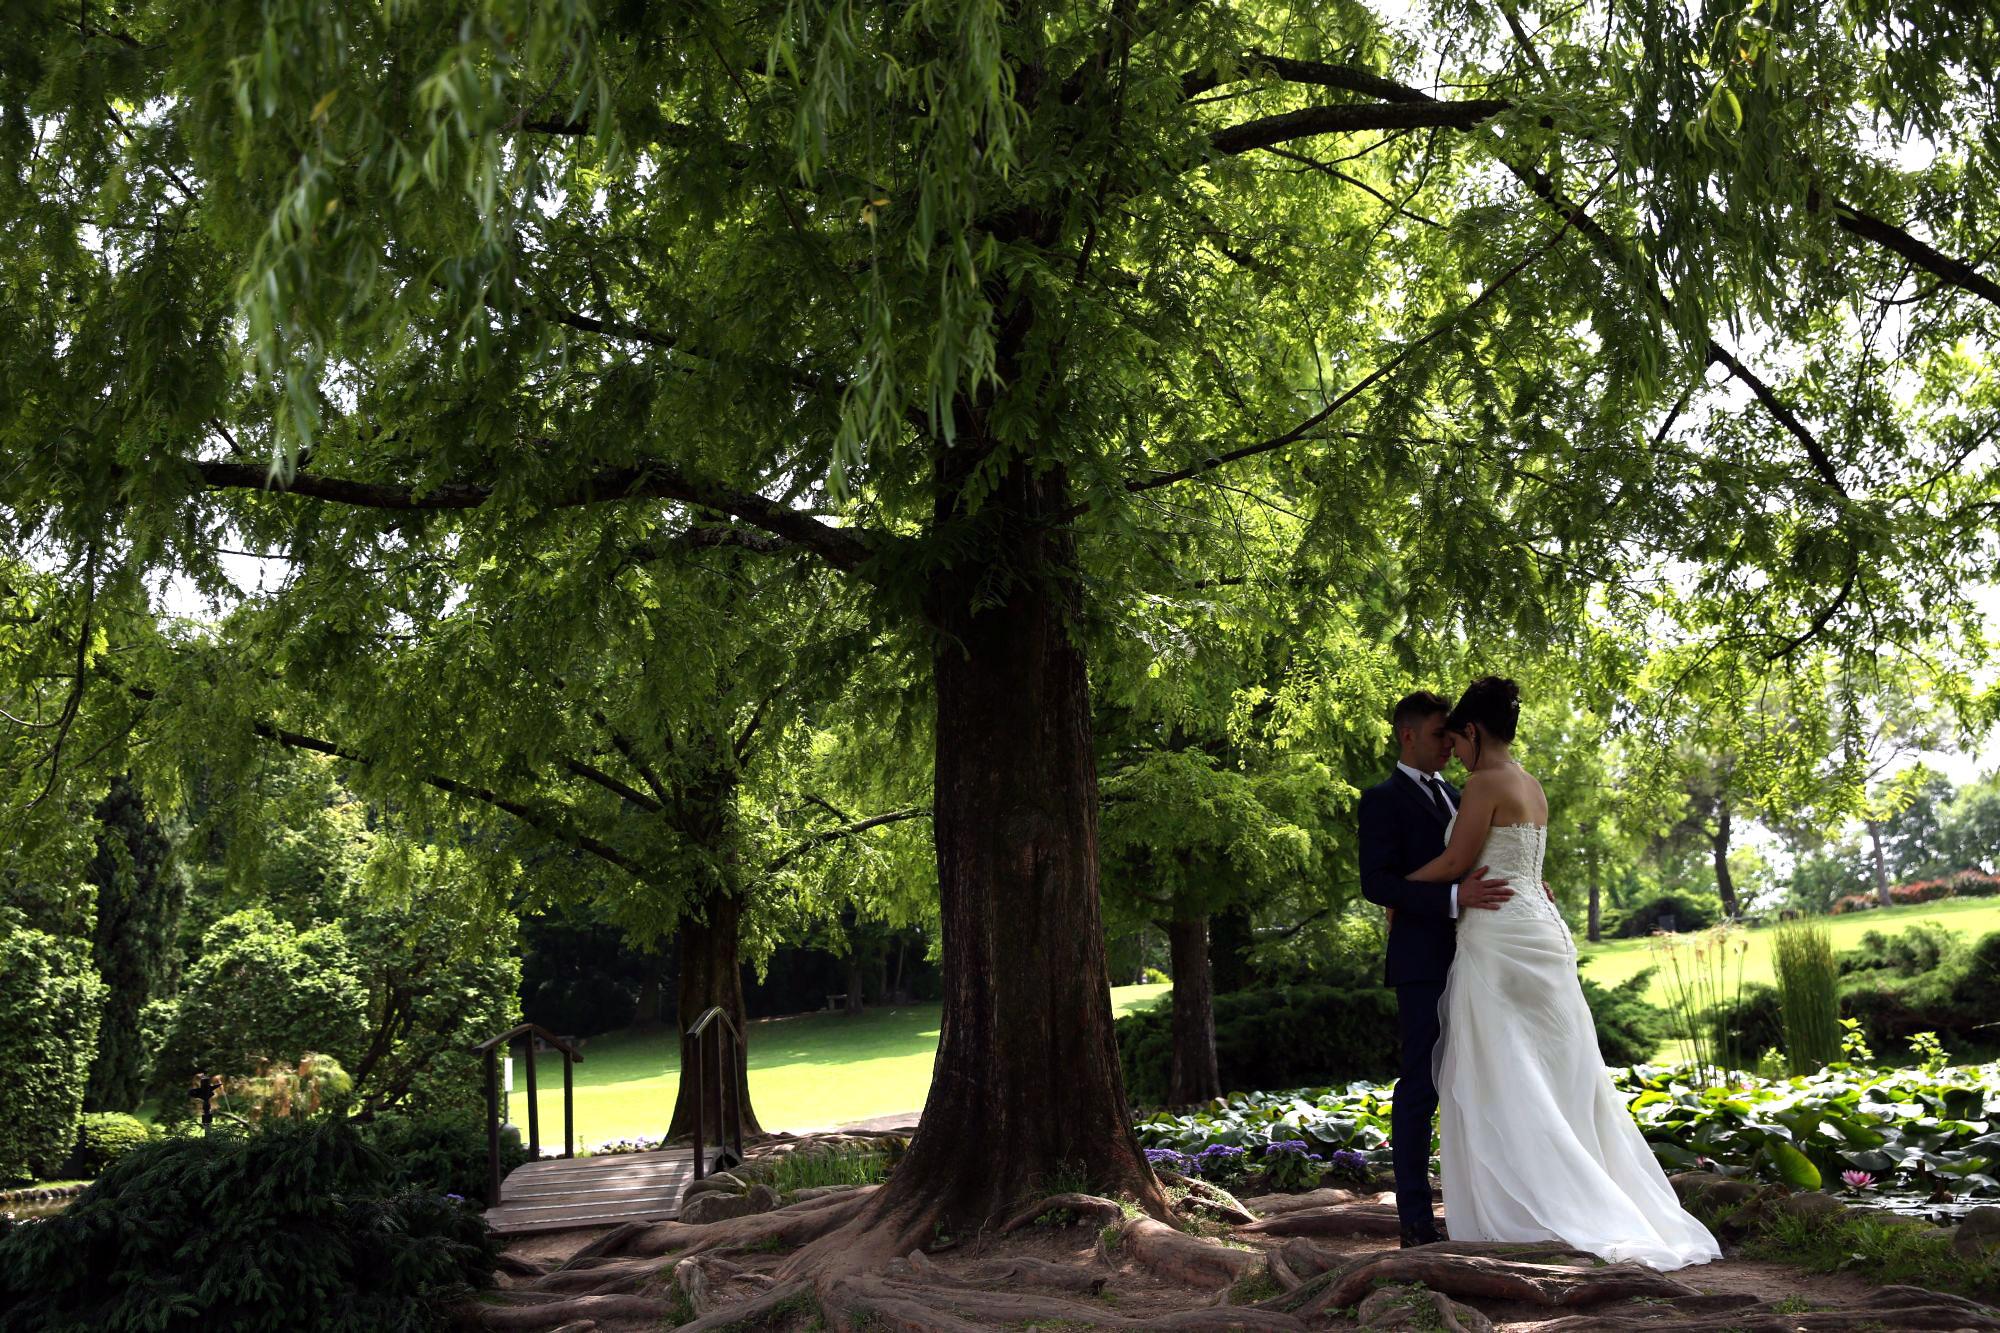 Onice event and wedding planner | Matrimonio Sara e Denis - Parco Sigurtà | Viva gli sposi